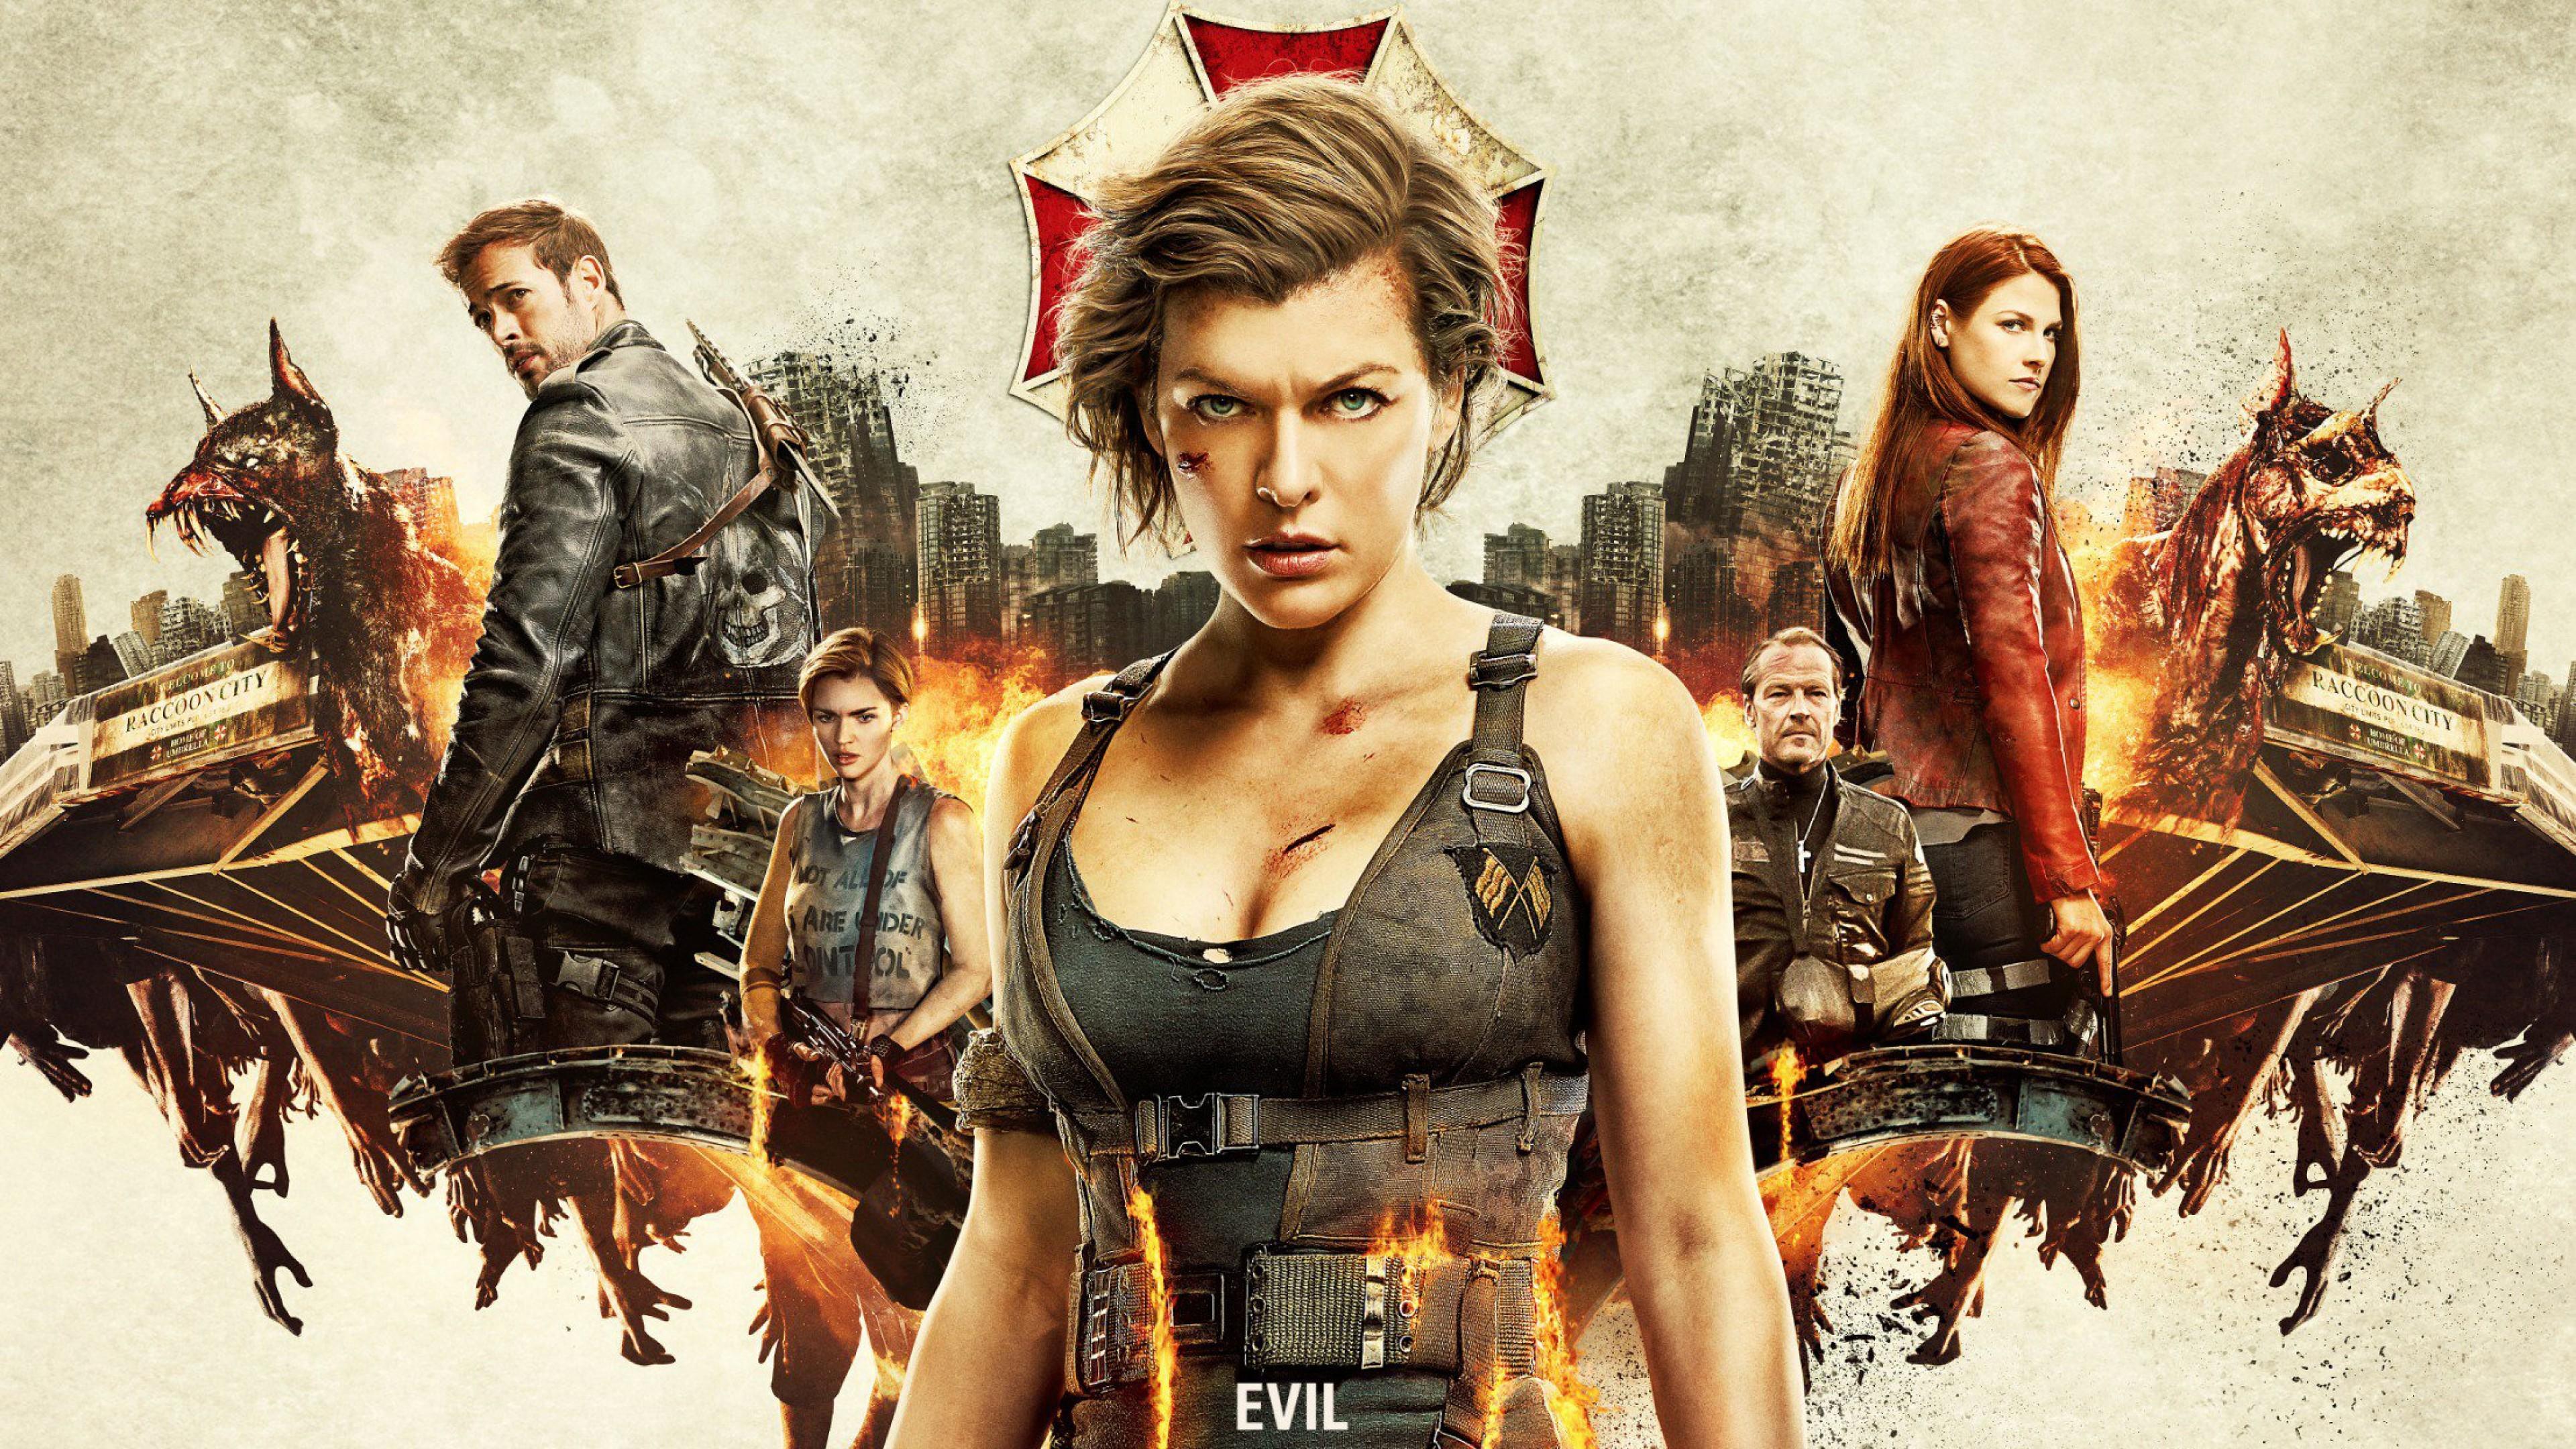 Milla Jovovich Ruby Rose Resident Evil The Final Chapter: Wallpaper Resident Evil: The Final Chapter, Milla Jovovich